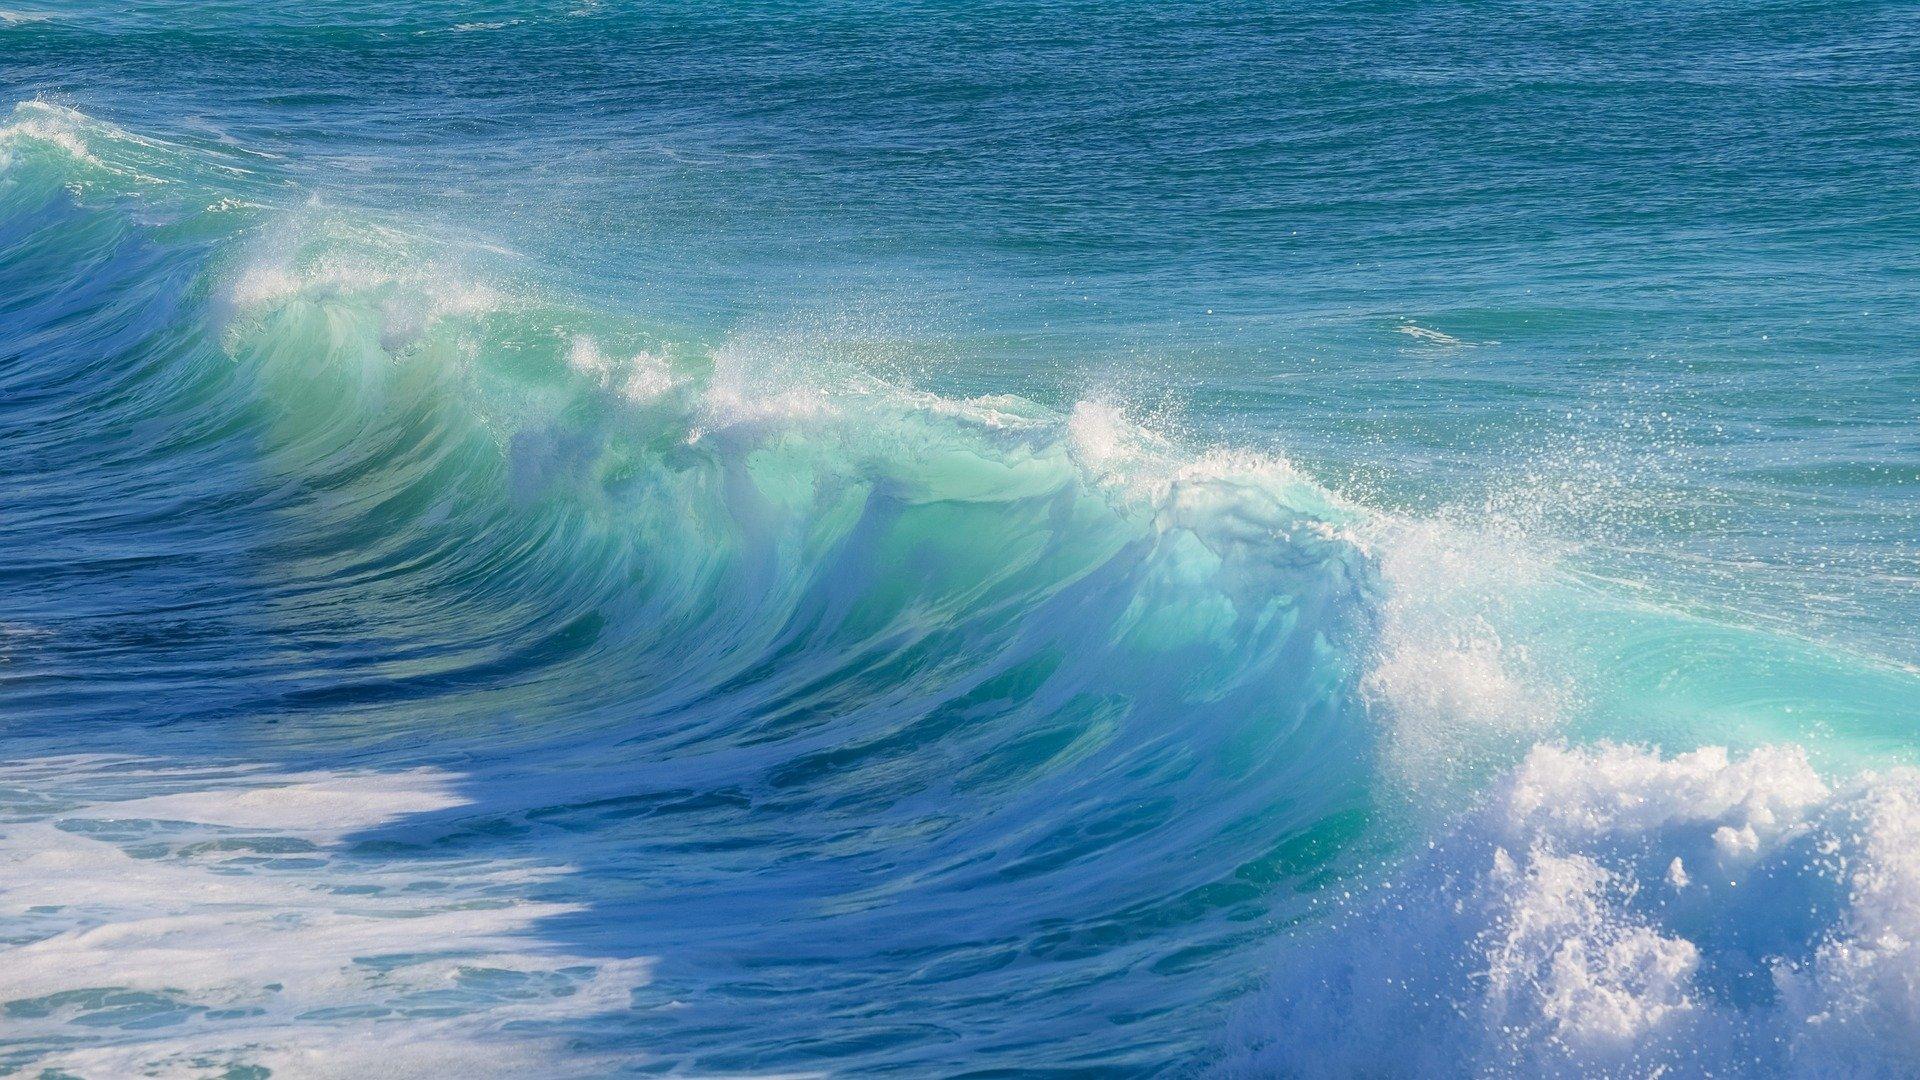 surf-3104869_1920